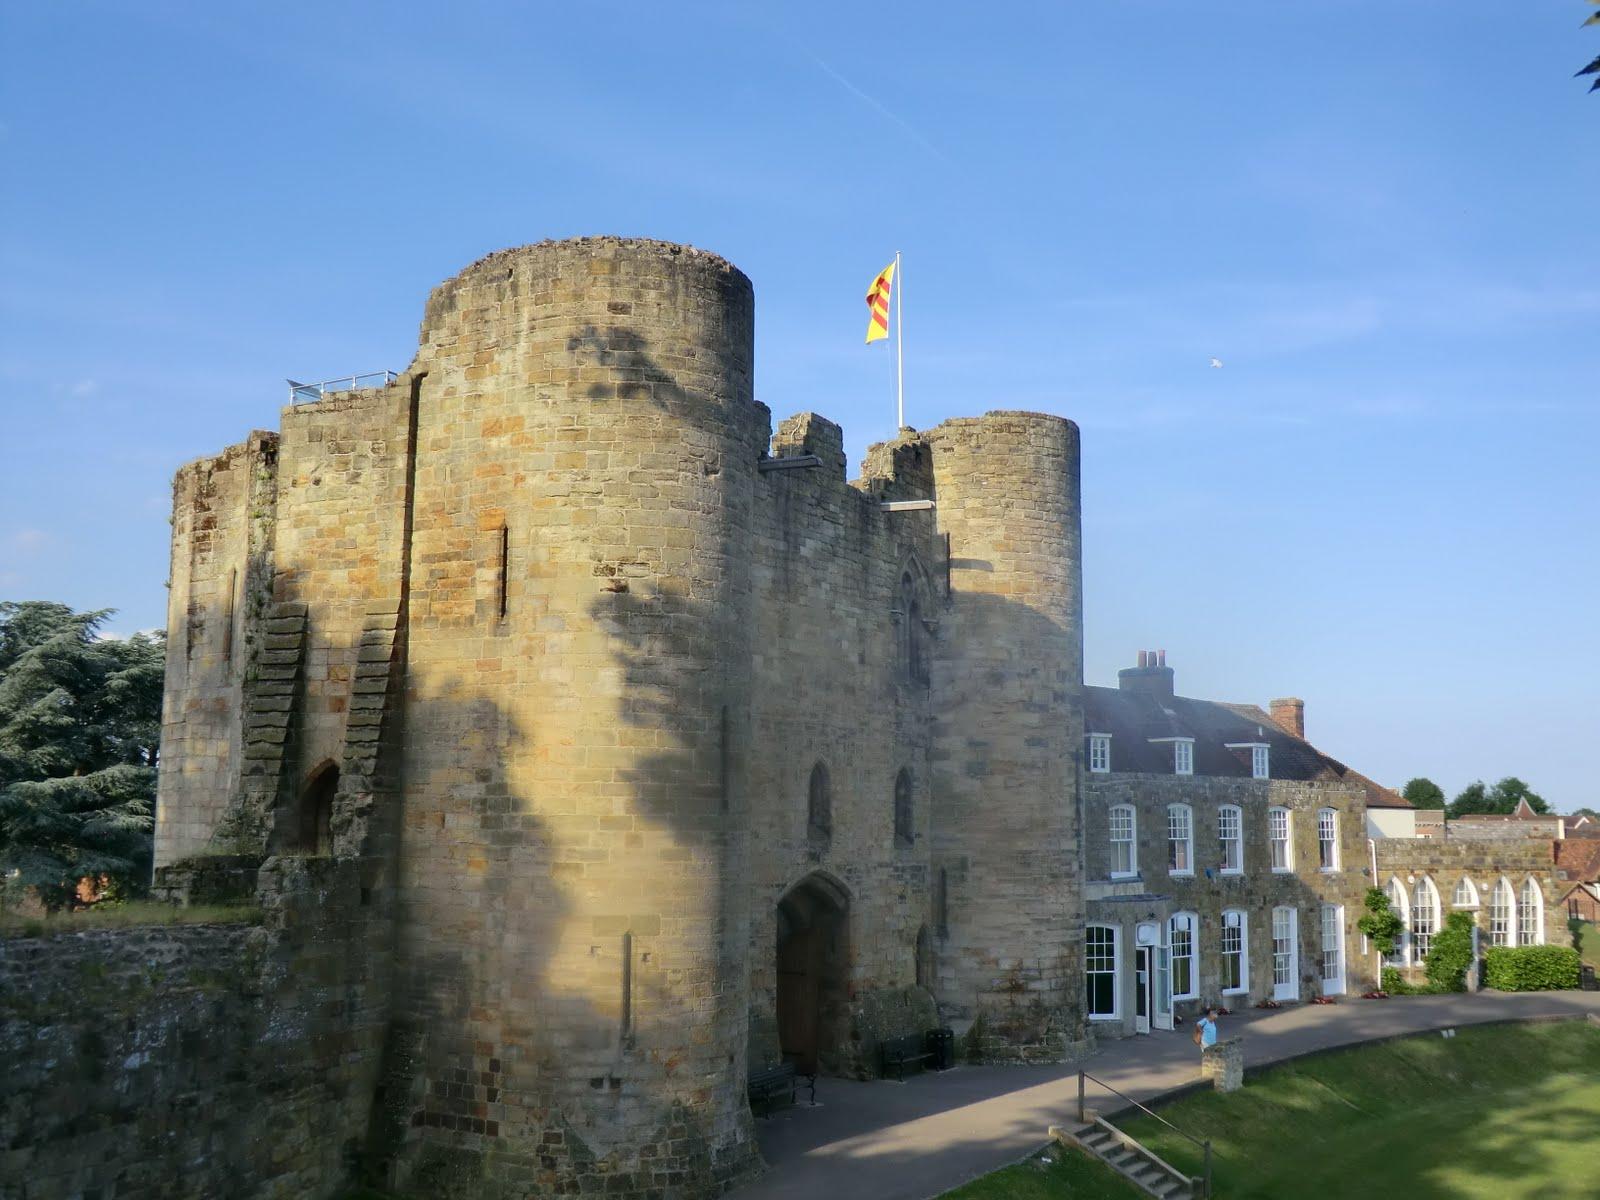 CIMG2024 Gatehouse, Tonbridge Castle